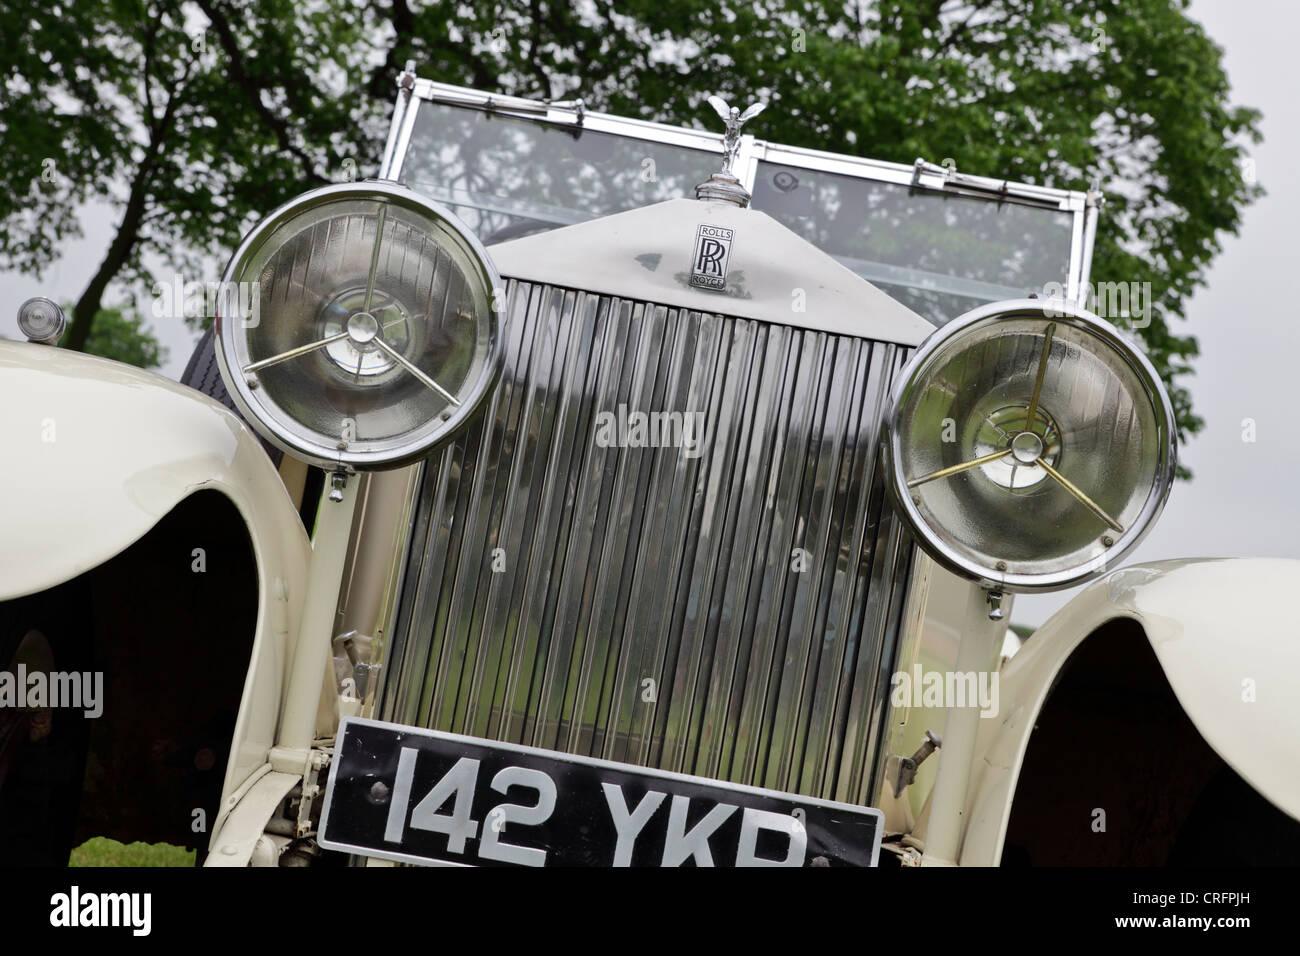 Rolls Royce Open Tourer 1937 Kraftfahrzeug. (4) von Peter Wheeler der Fotograf. Stockbild